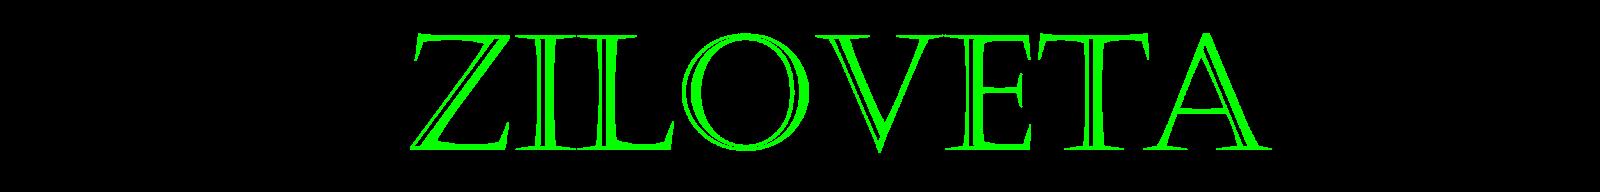 ZiLoveTa